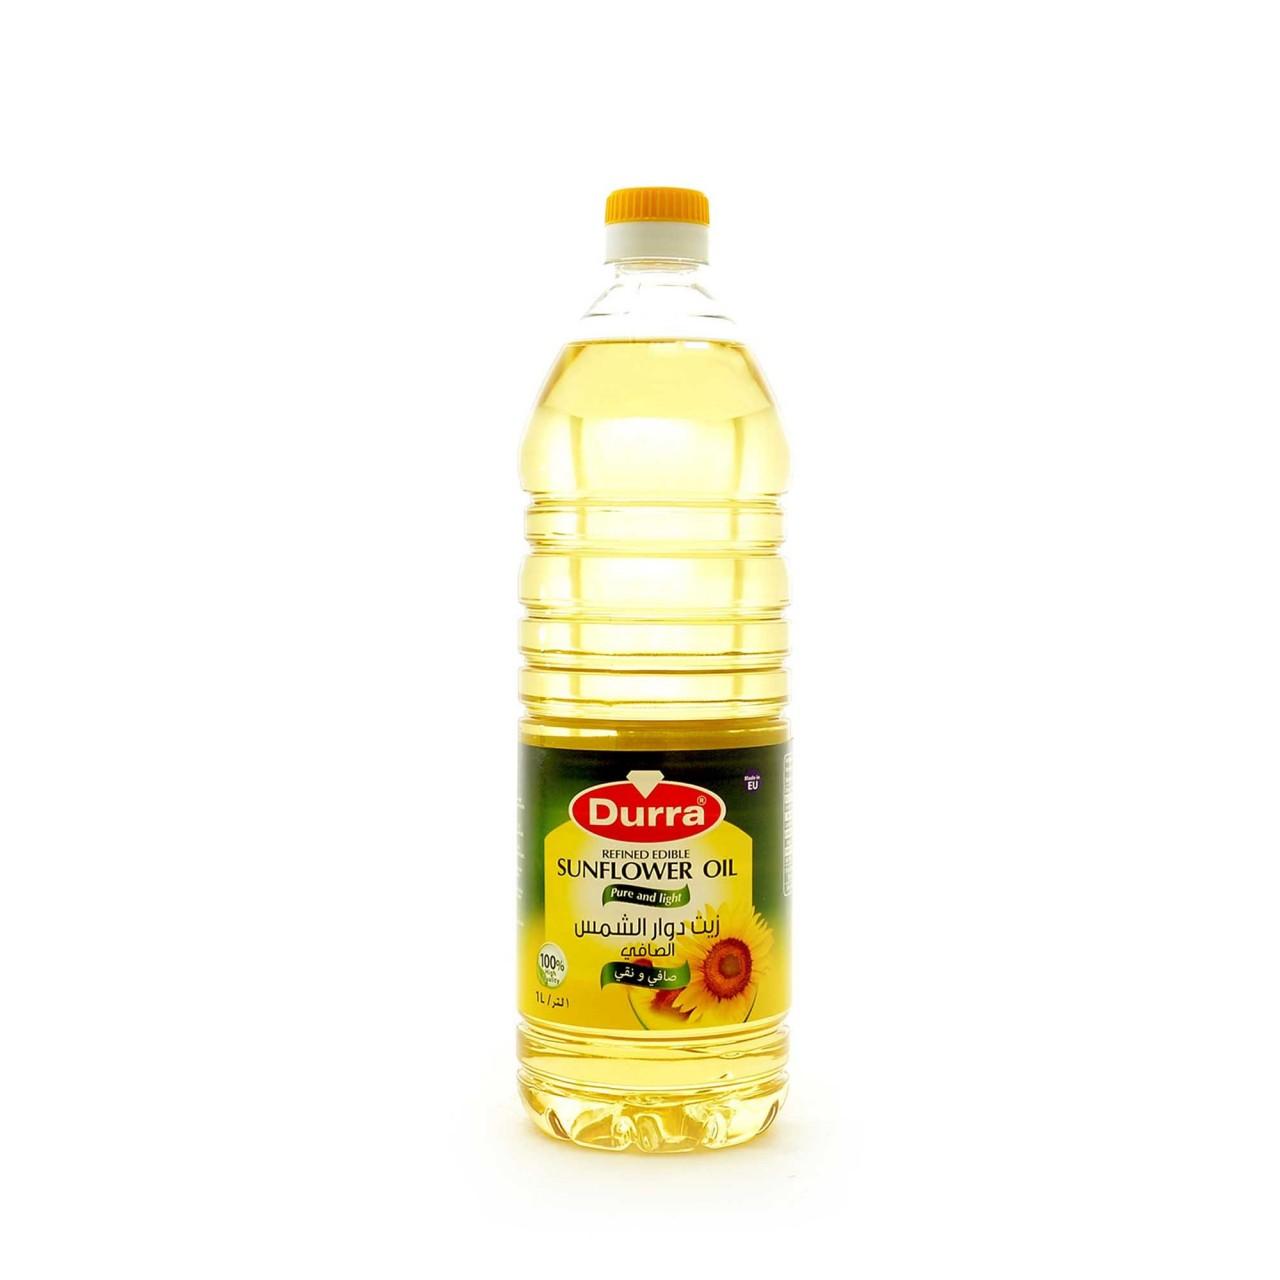 Durra Sunflower Oil